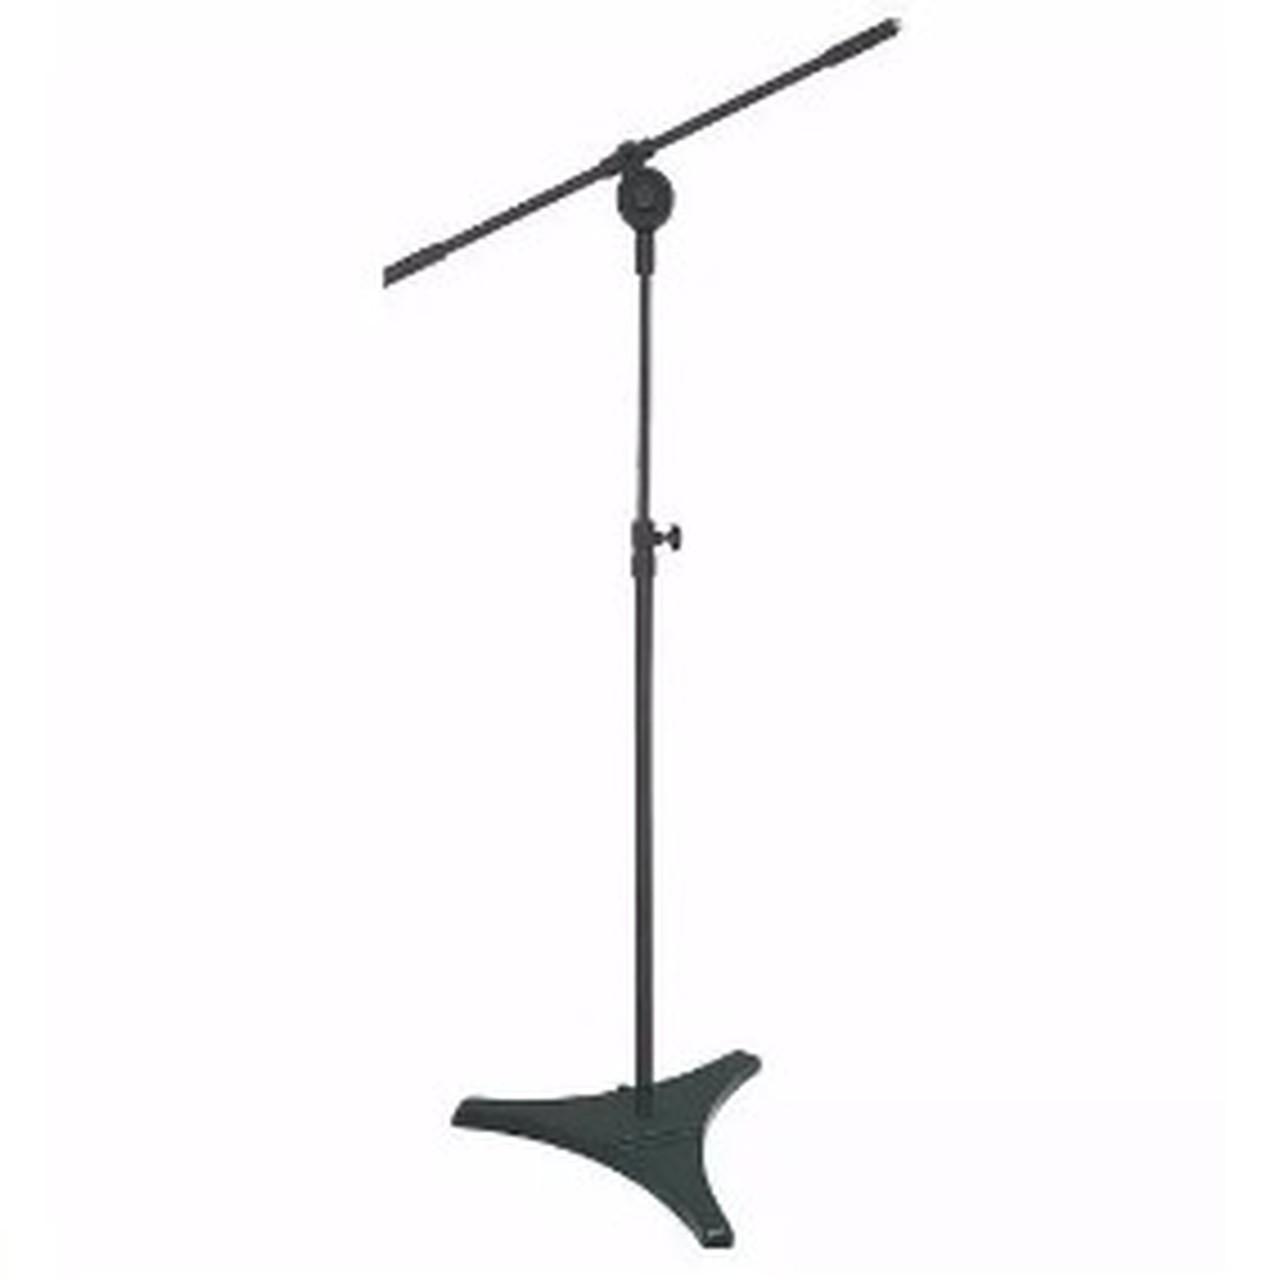 Pedestal Girafa Para Microfone Pés De Ferro Hpm-58